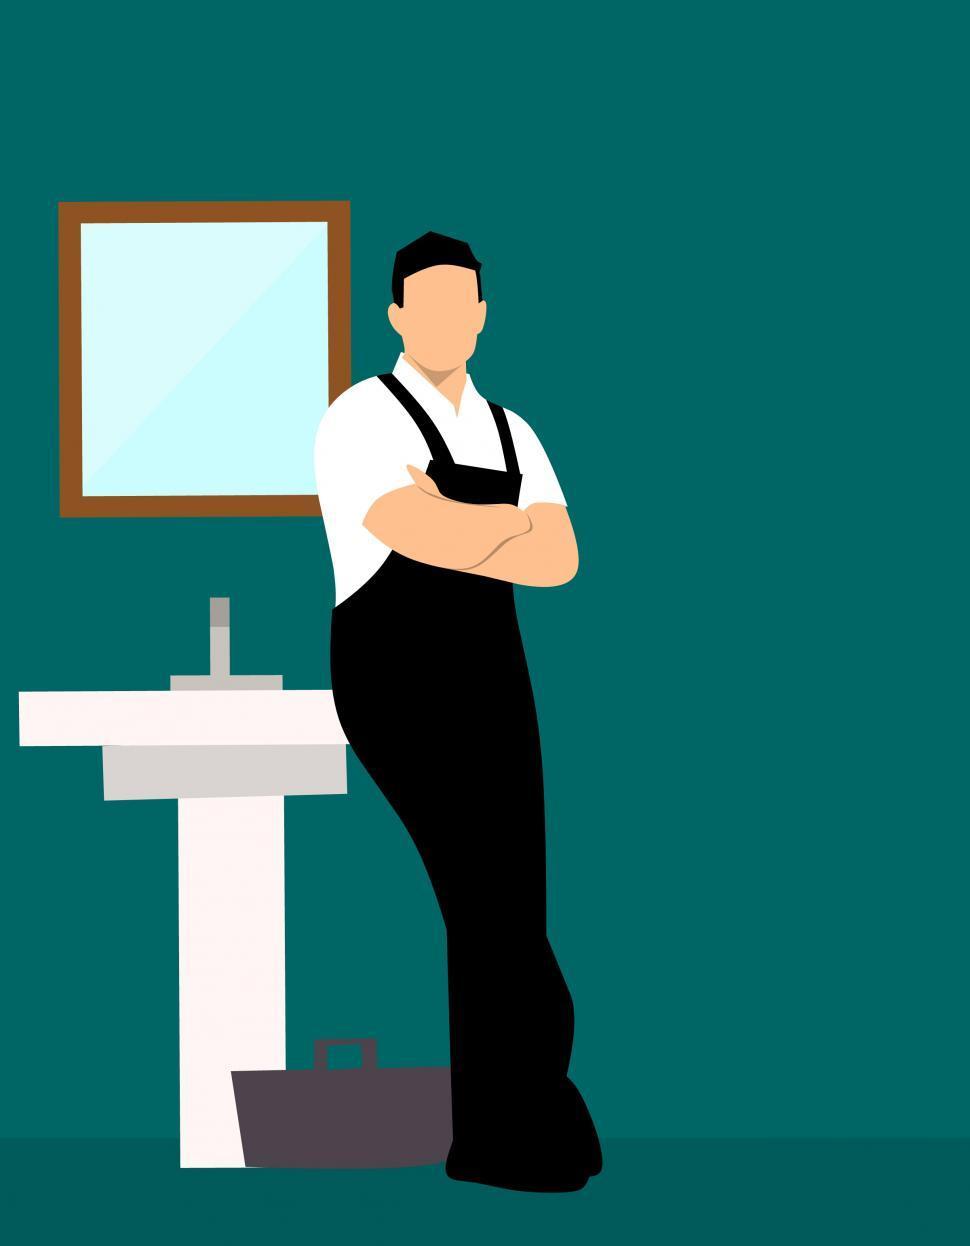 Download Free Stock HD Photo of plumber man  Online